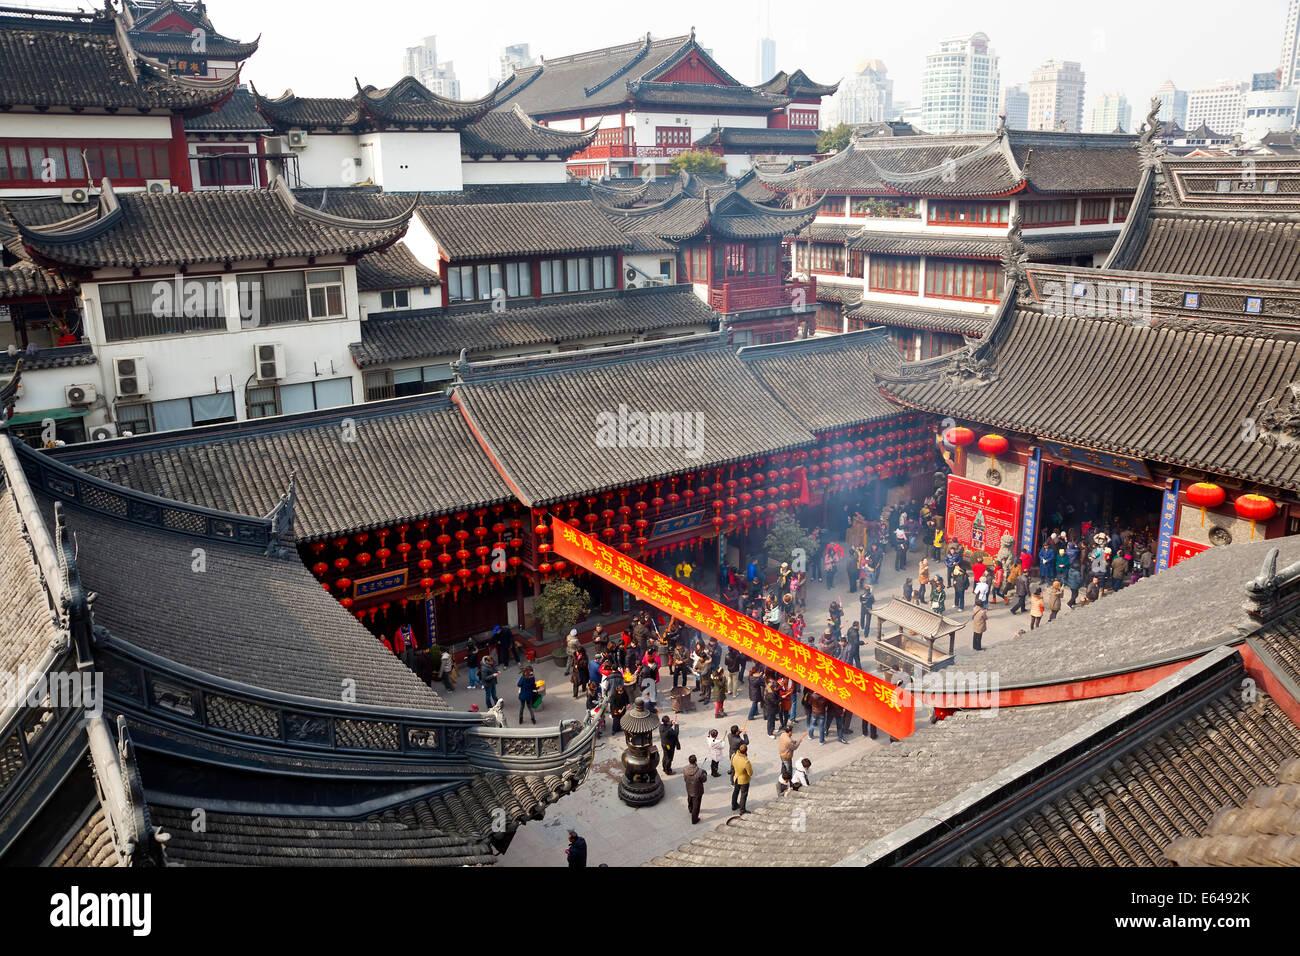 Tempio, l' Yuyuan Gardens, Shanghai, Cina Immagini Stock